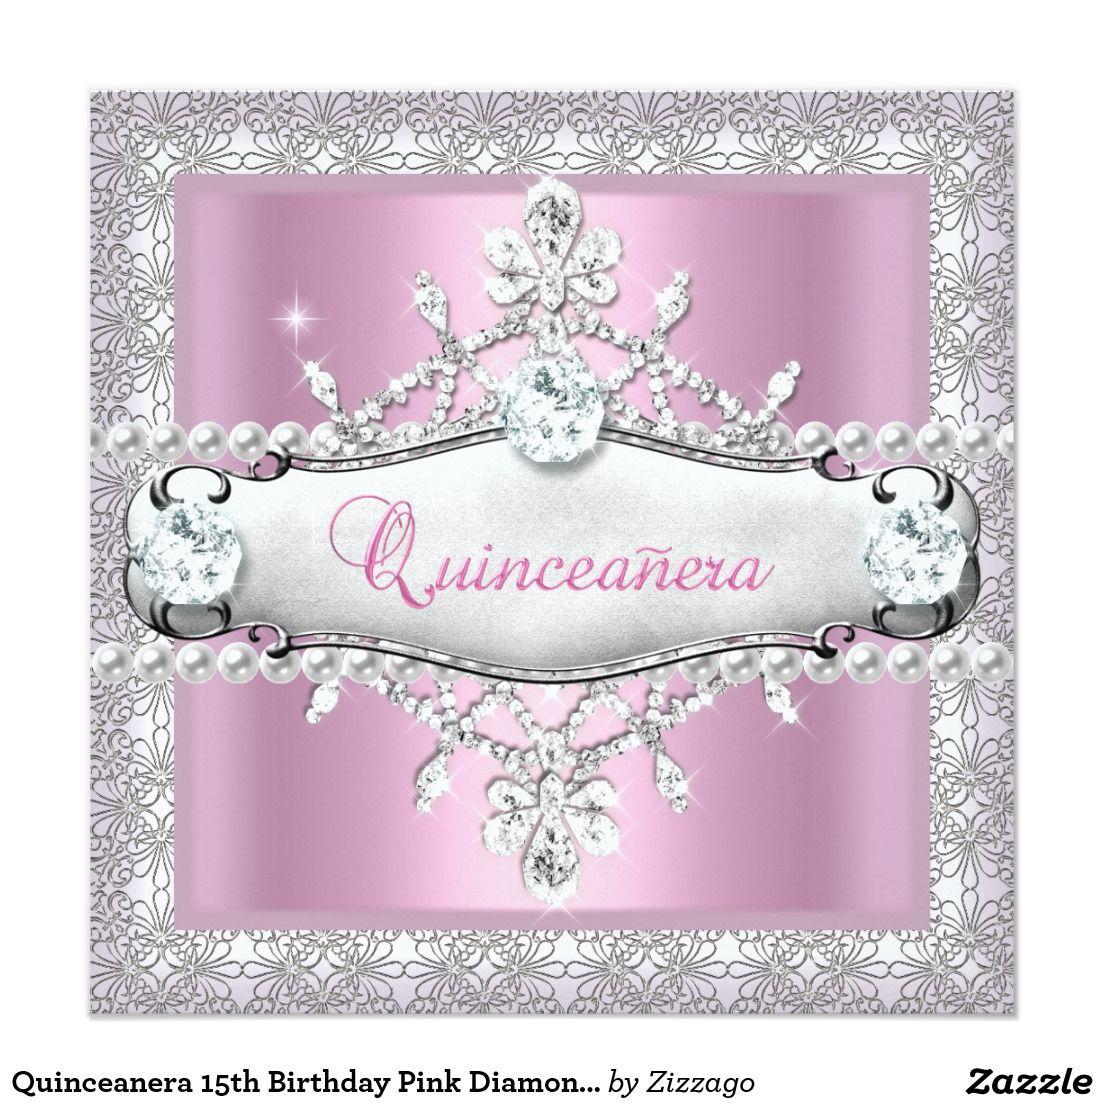 Quinceanera 15th Birthday Pink Diamond Tiara Invitation ...